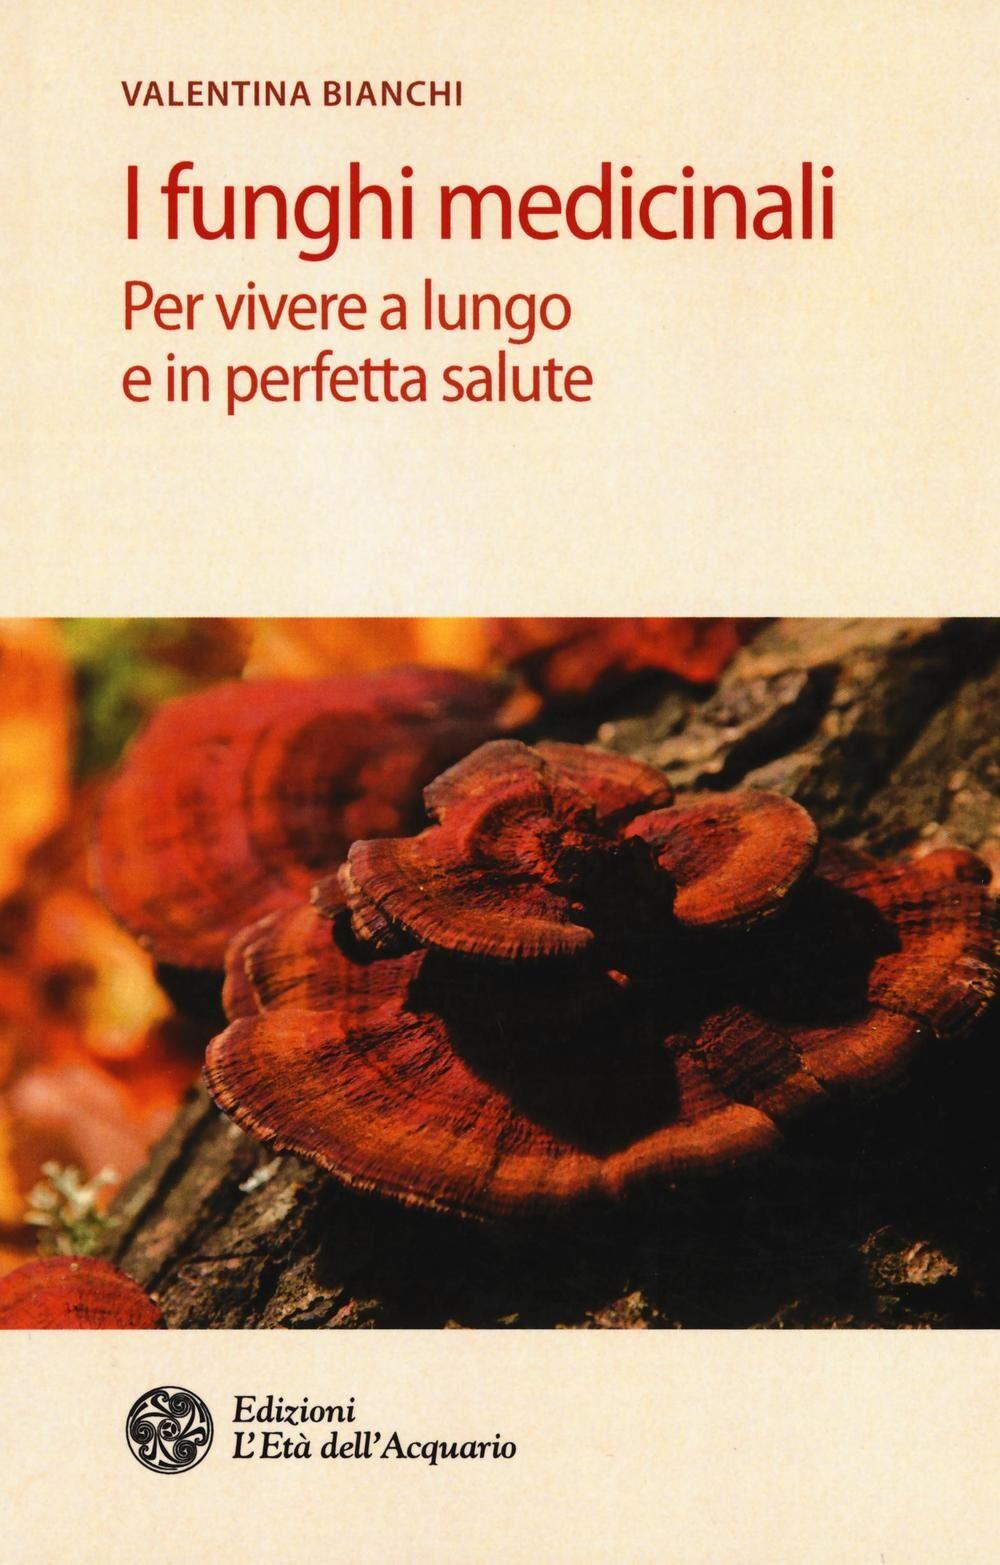 I funghi medicinali. Per vivere a lungo in perfetta salute